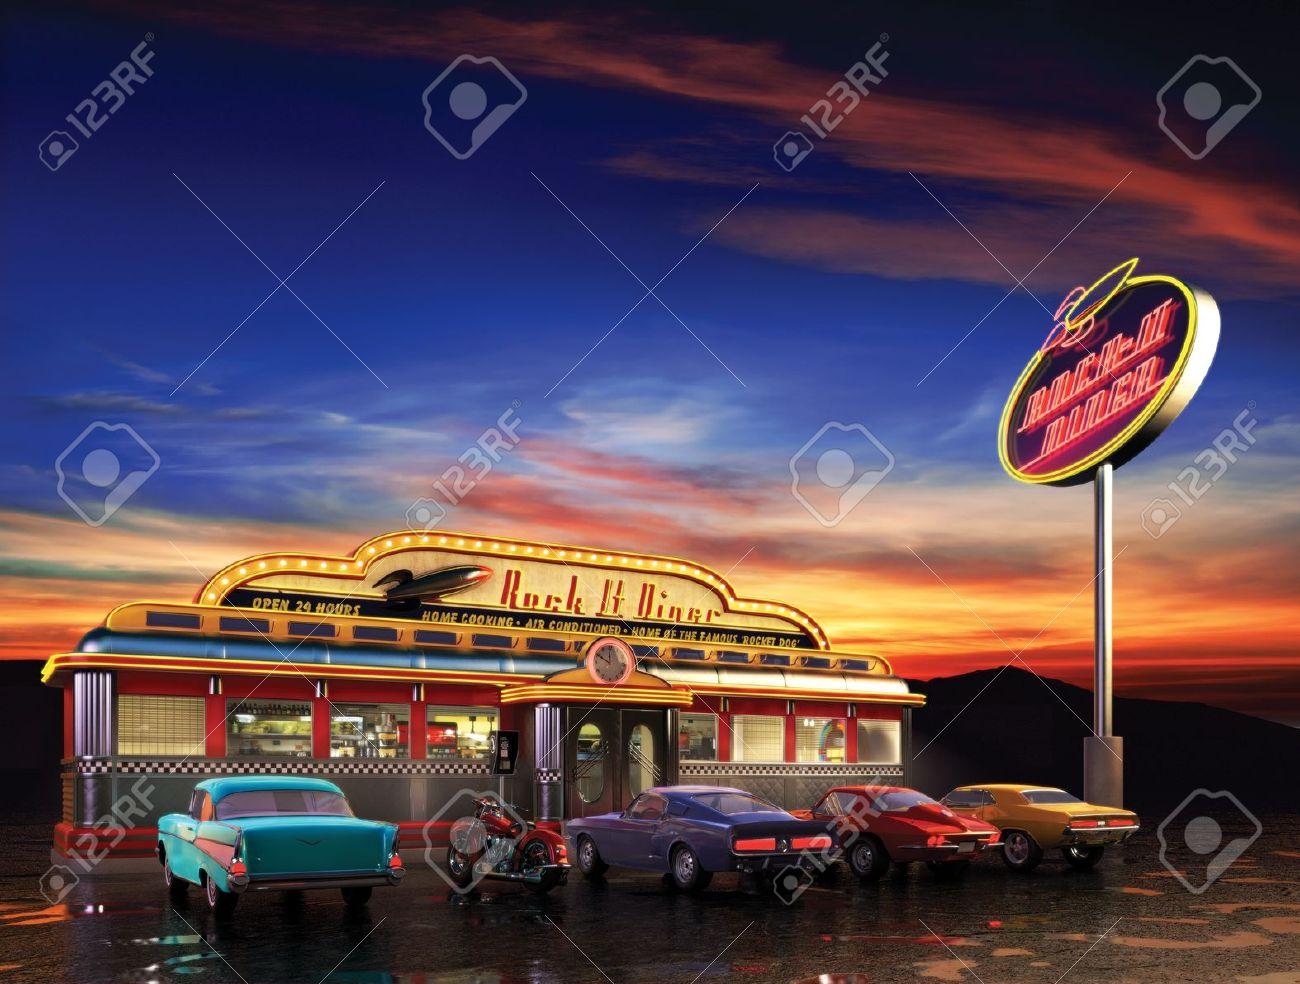 Retro American diner at dusk - 7058883